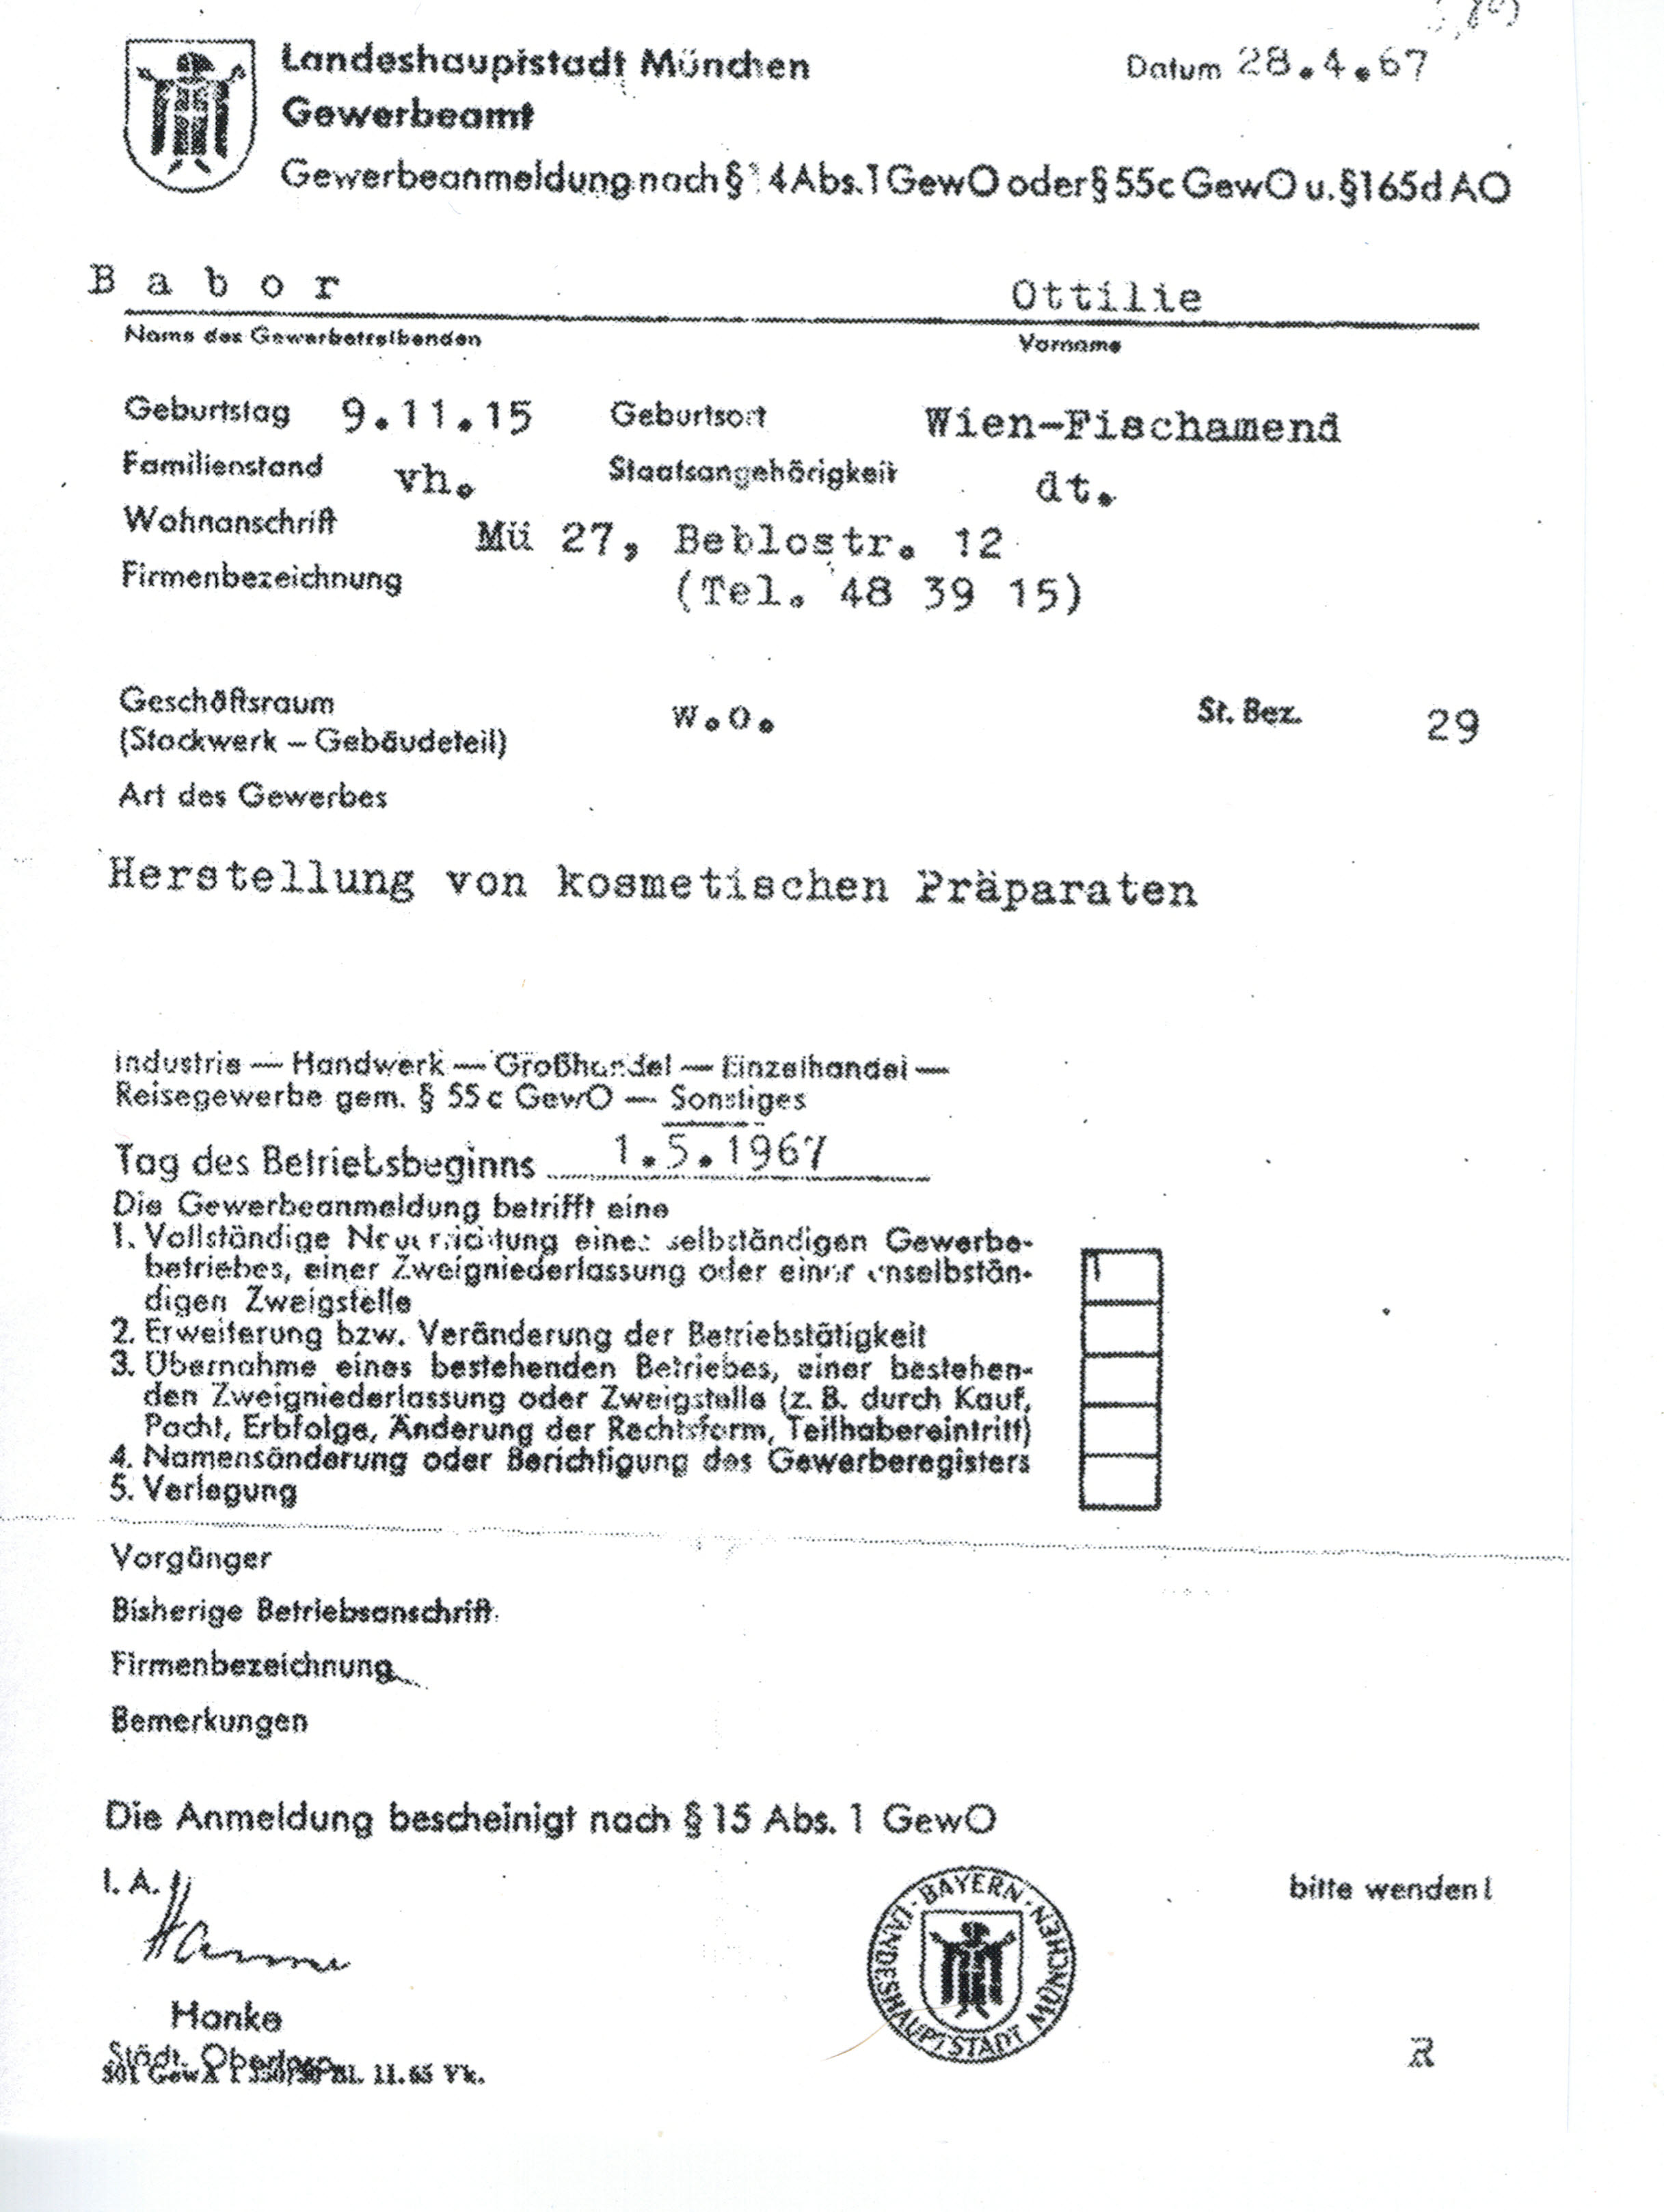 Gewerbeanmeldung 28.April 1967